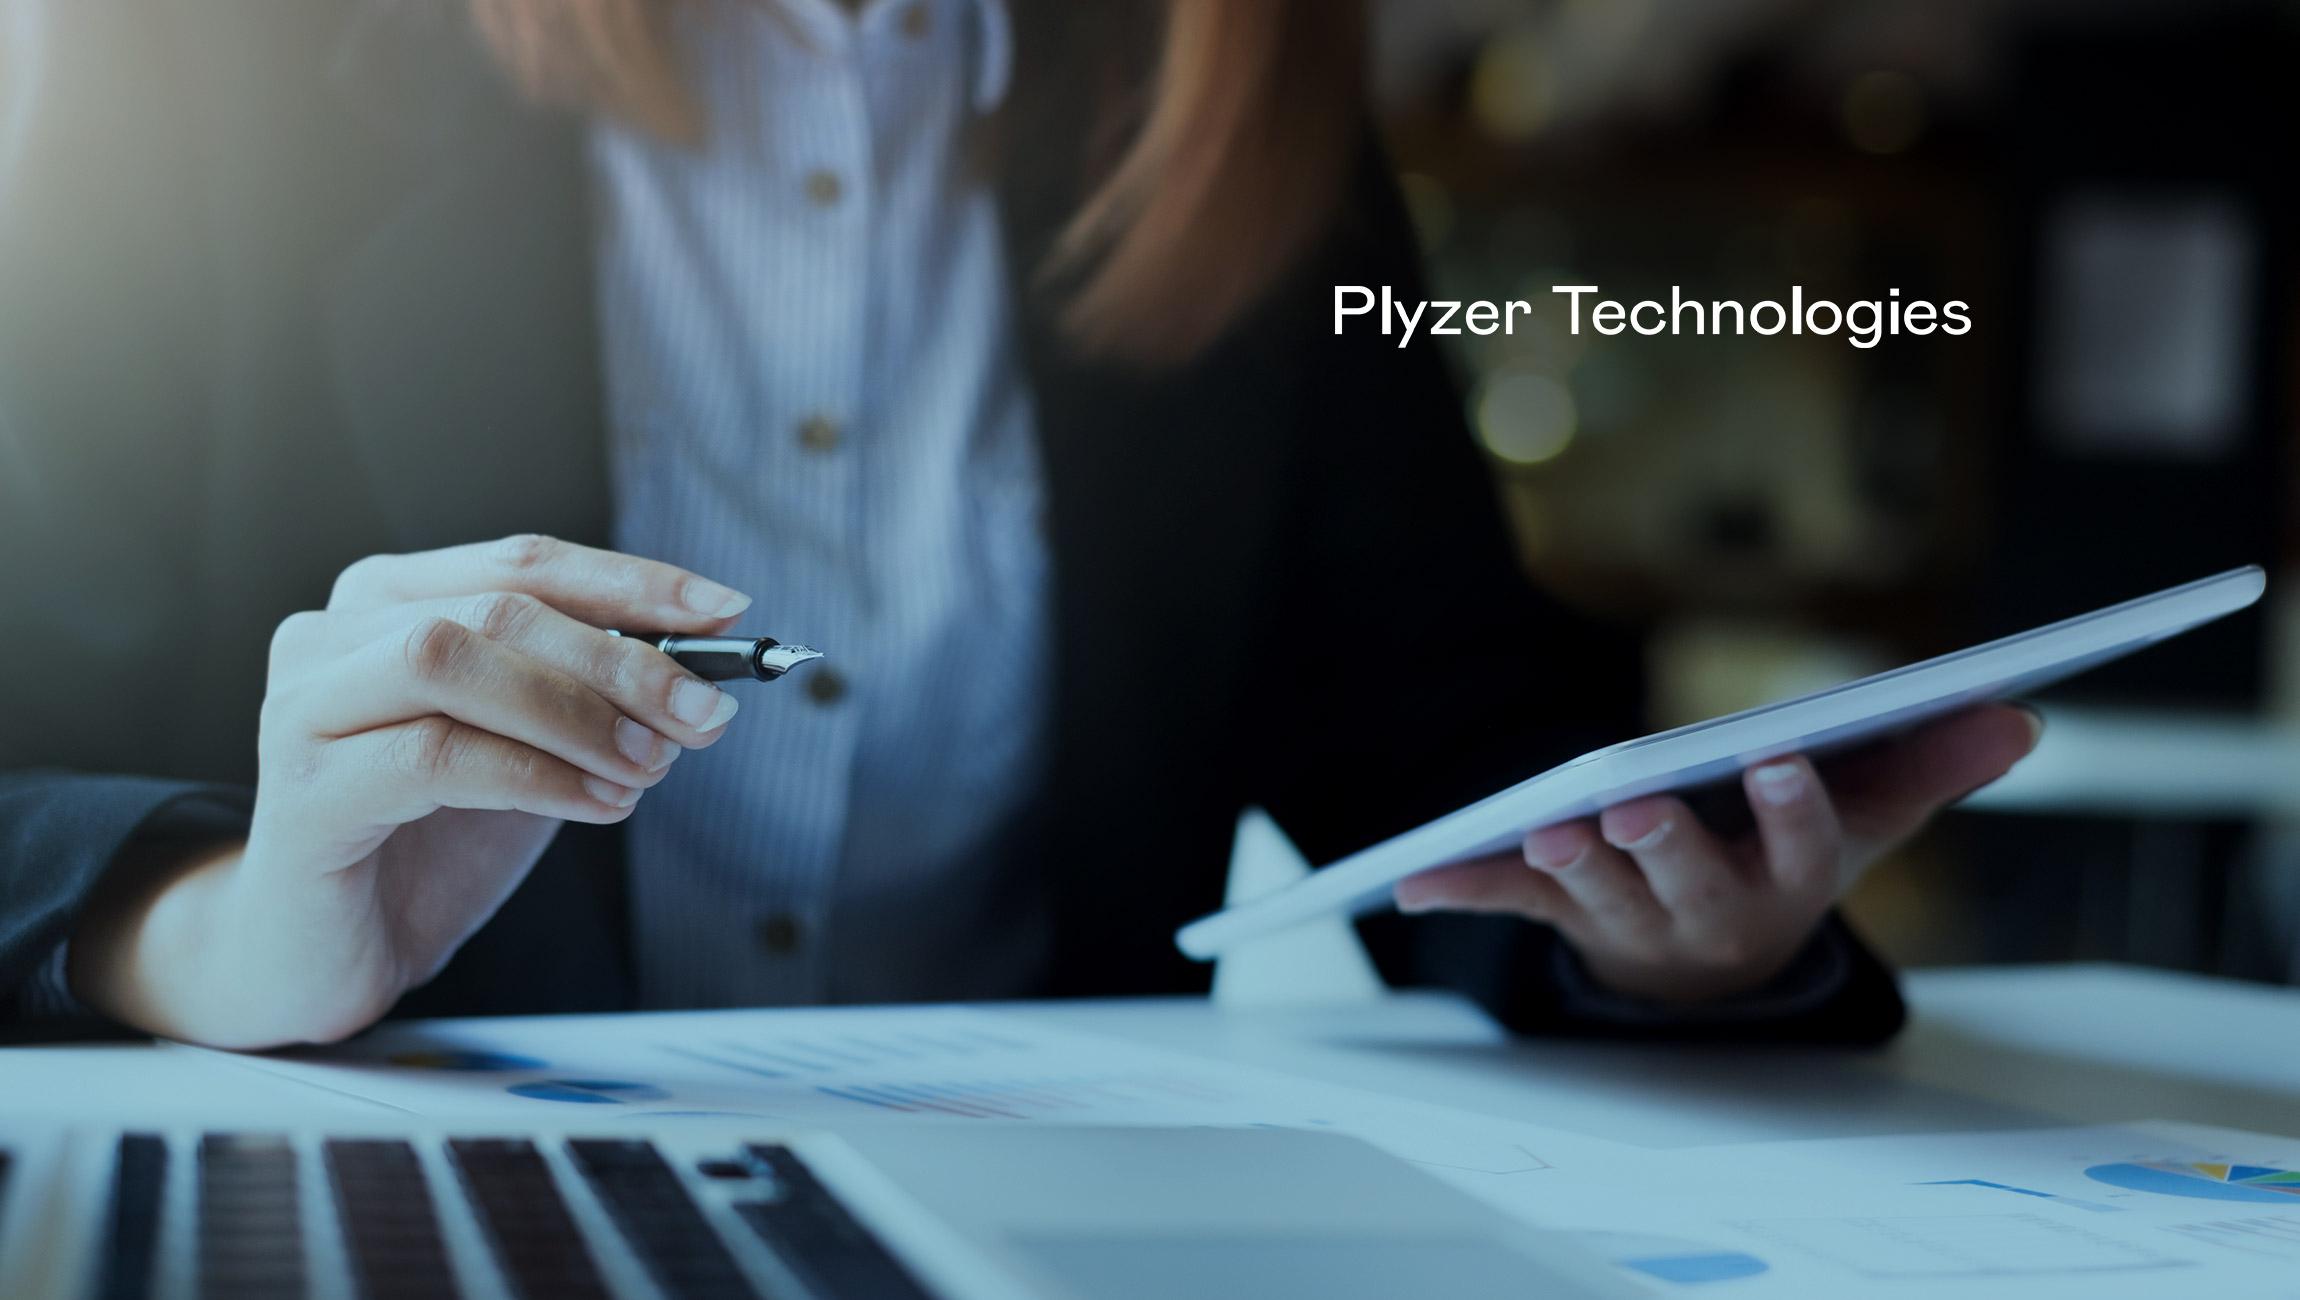 Plyzer Technologies Inc. Signs ISDIN as a New SAAS Customer for Its Plyzer Intelligence Platform